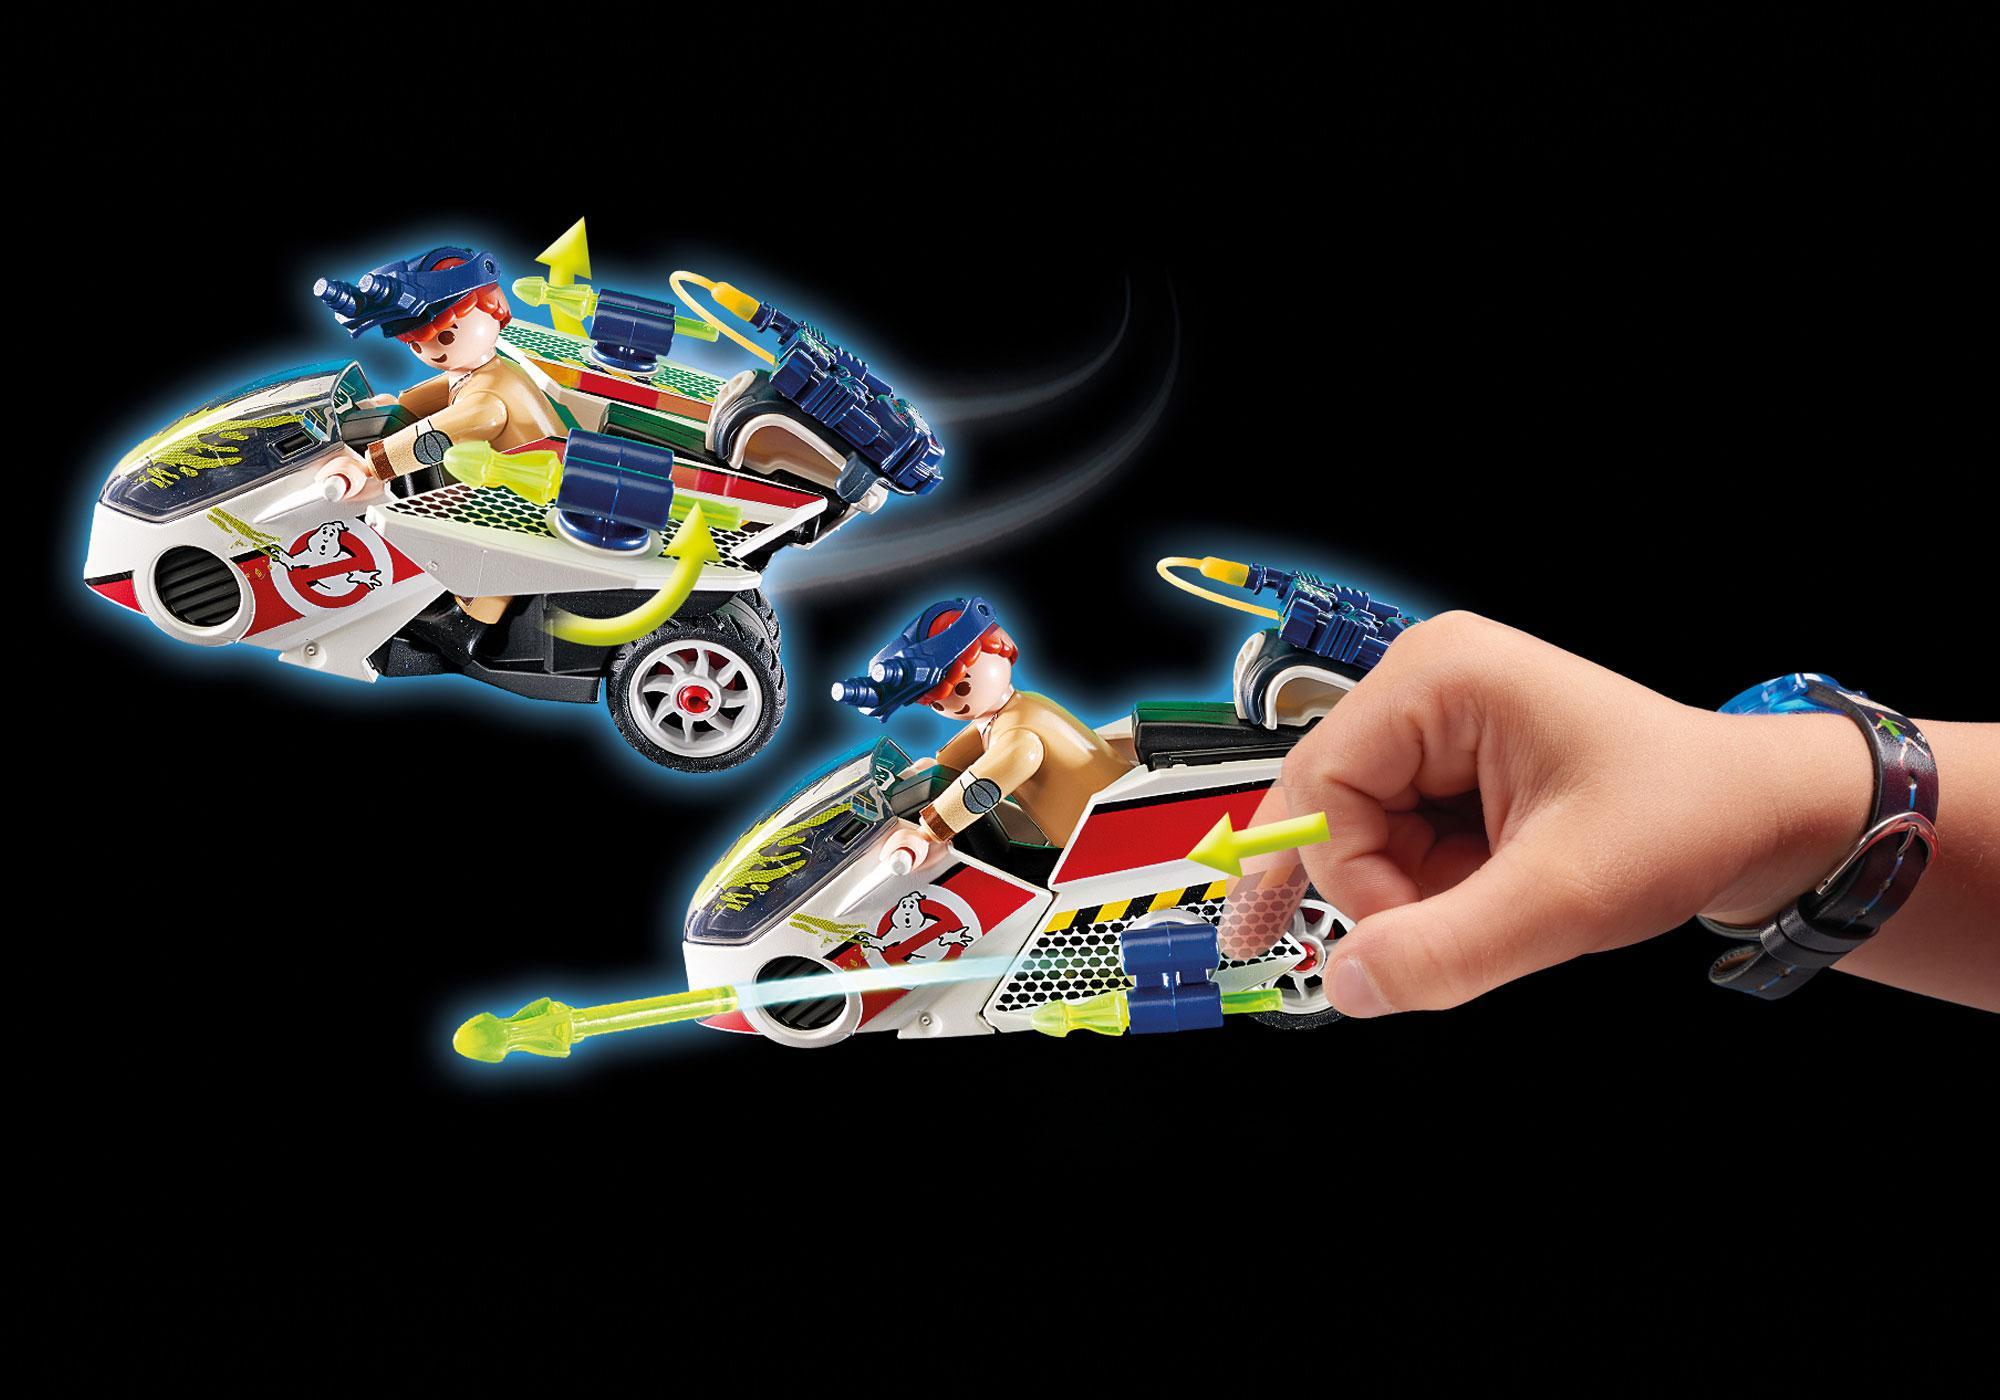 http://media.playmobil.com/i/playmobil/9388_product_extra1/Stantz avec véhicule volant